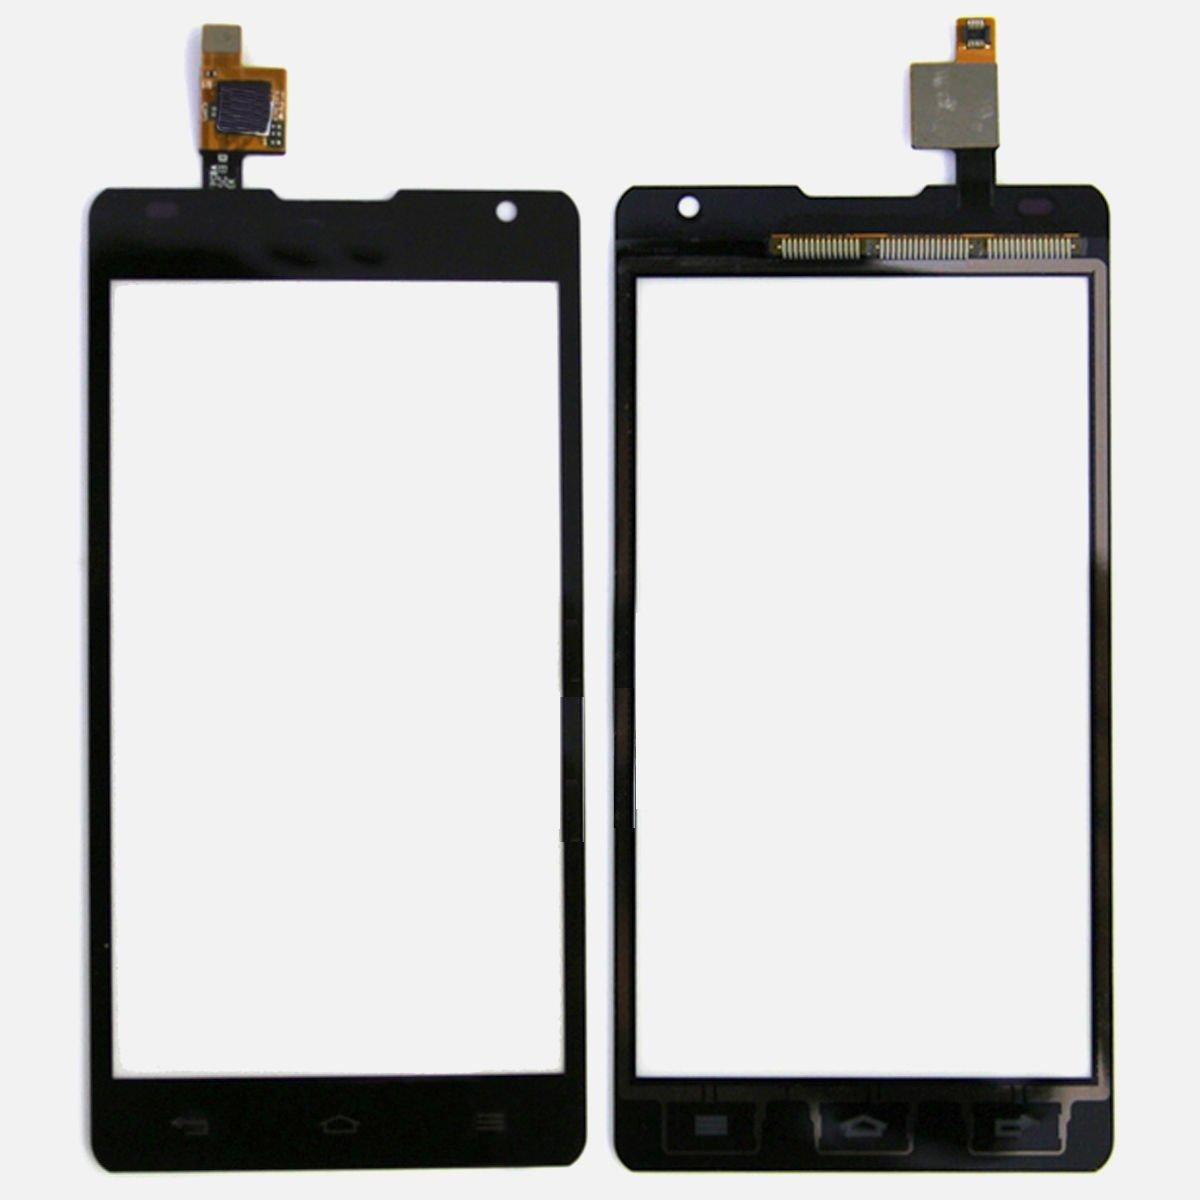 New Original LG Spirit MS870 Front Outer Top Glass Touch Lens Screen Digitizer